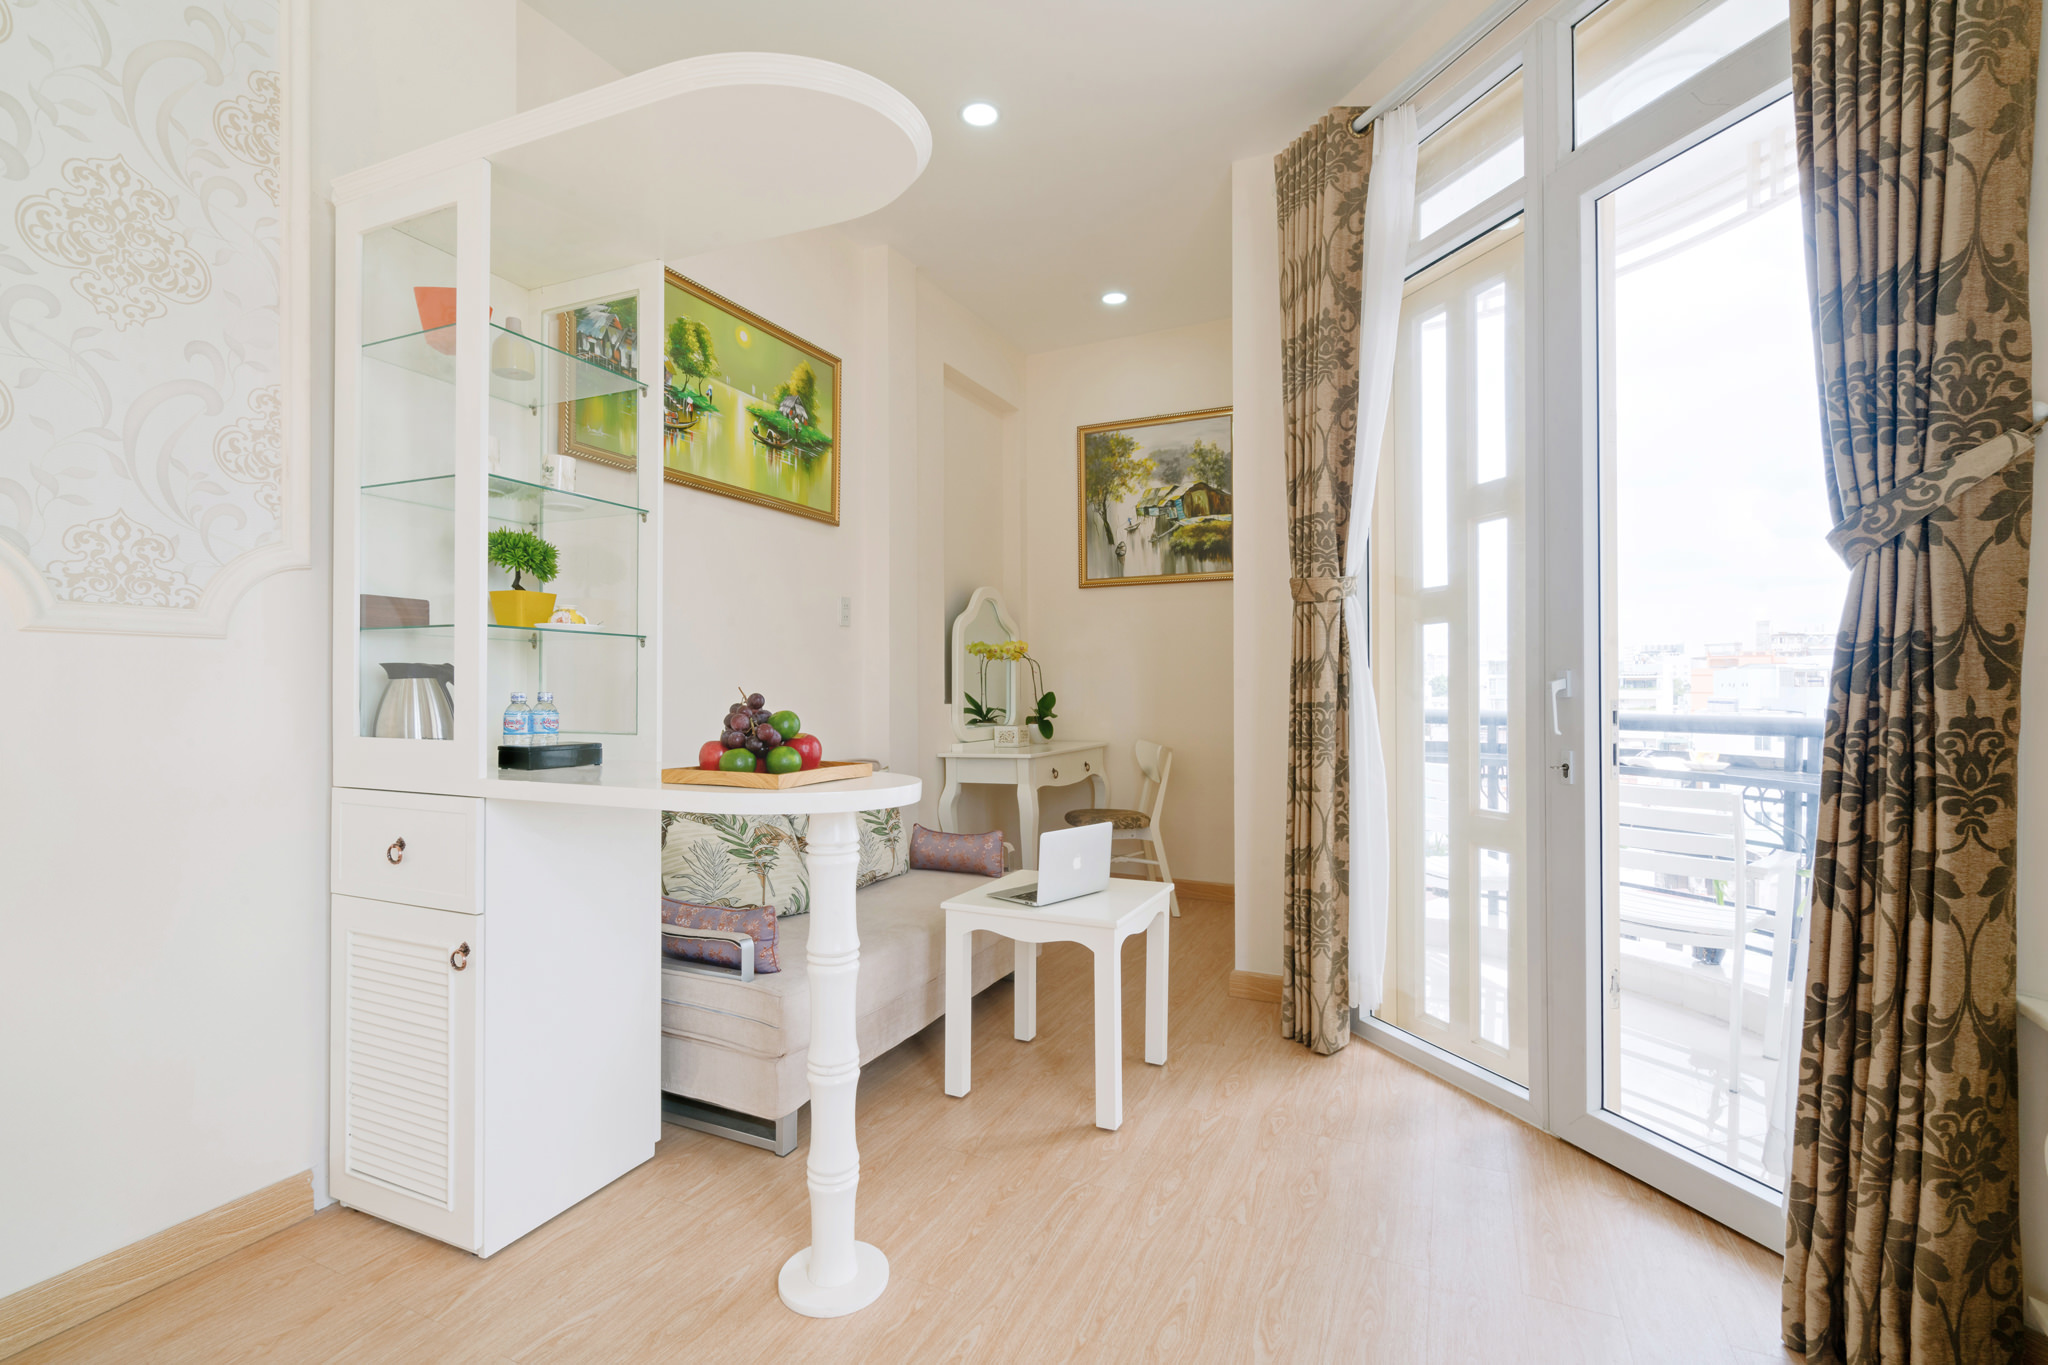 20180529 - Chez Mimosa - Interior - Hotel - 022.jpg